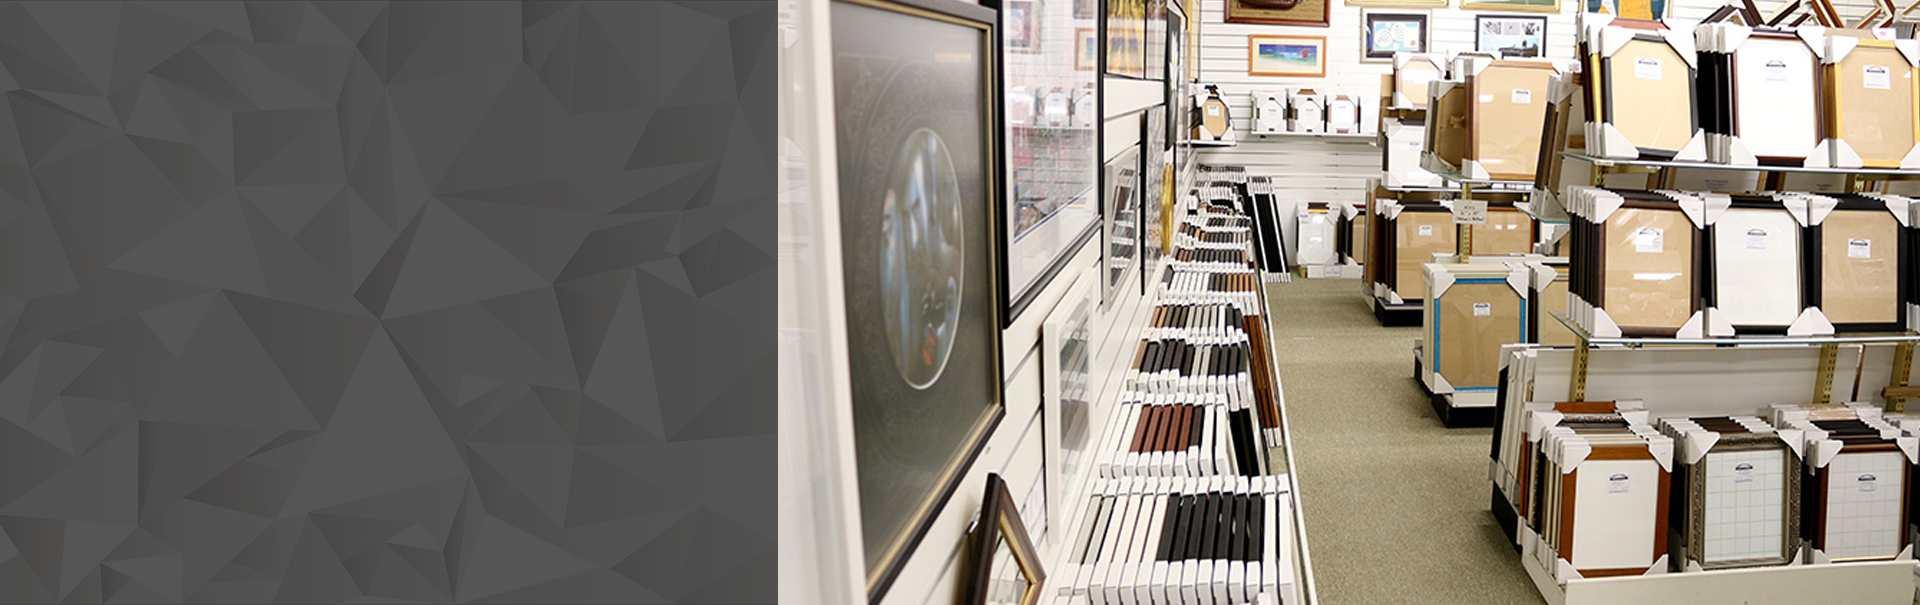 Buy Ready Made & Cheap Custom Photo Framing Online Sydney, Australia